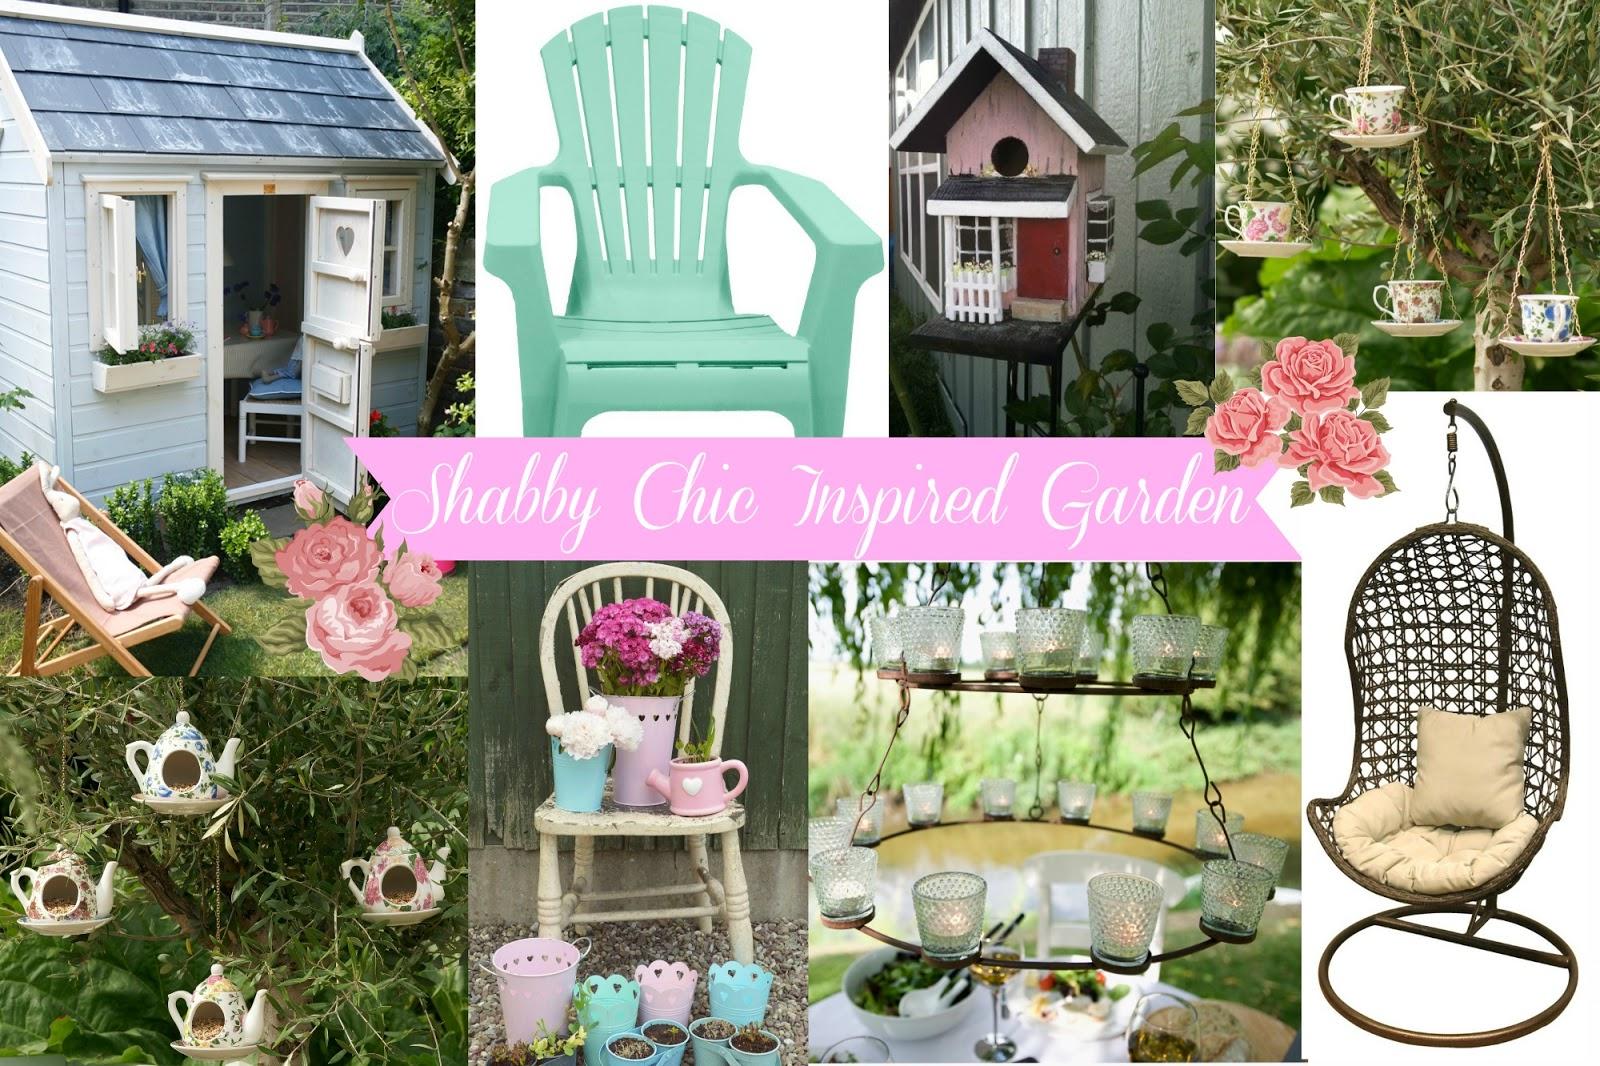 A Shabby Chic Inspired Garden ♥